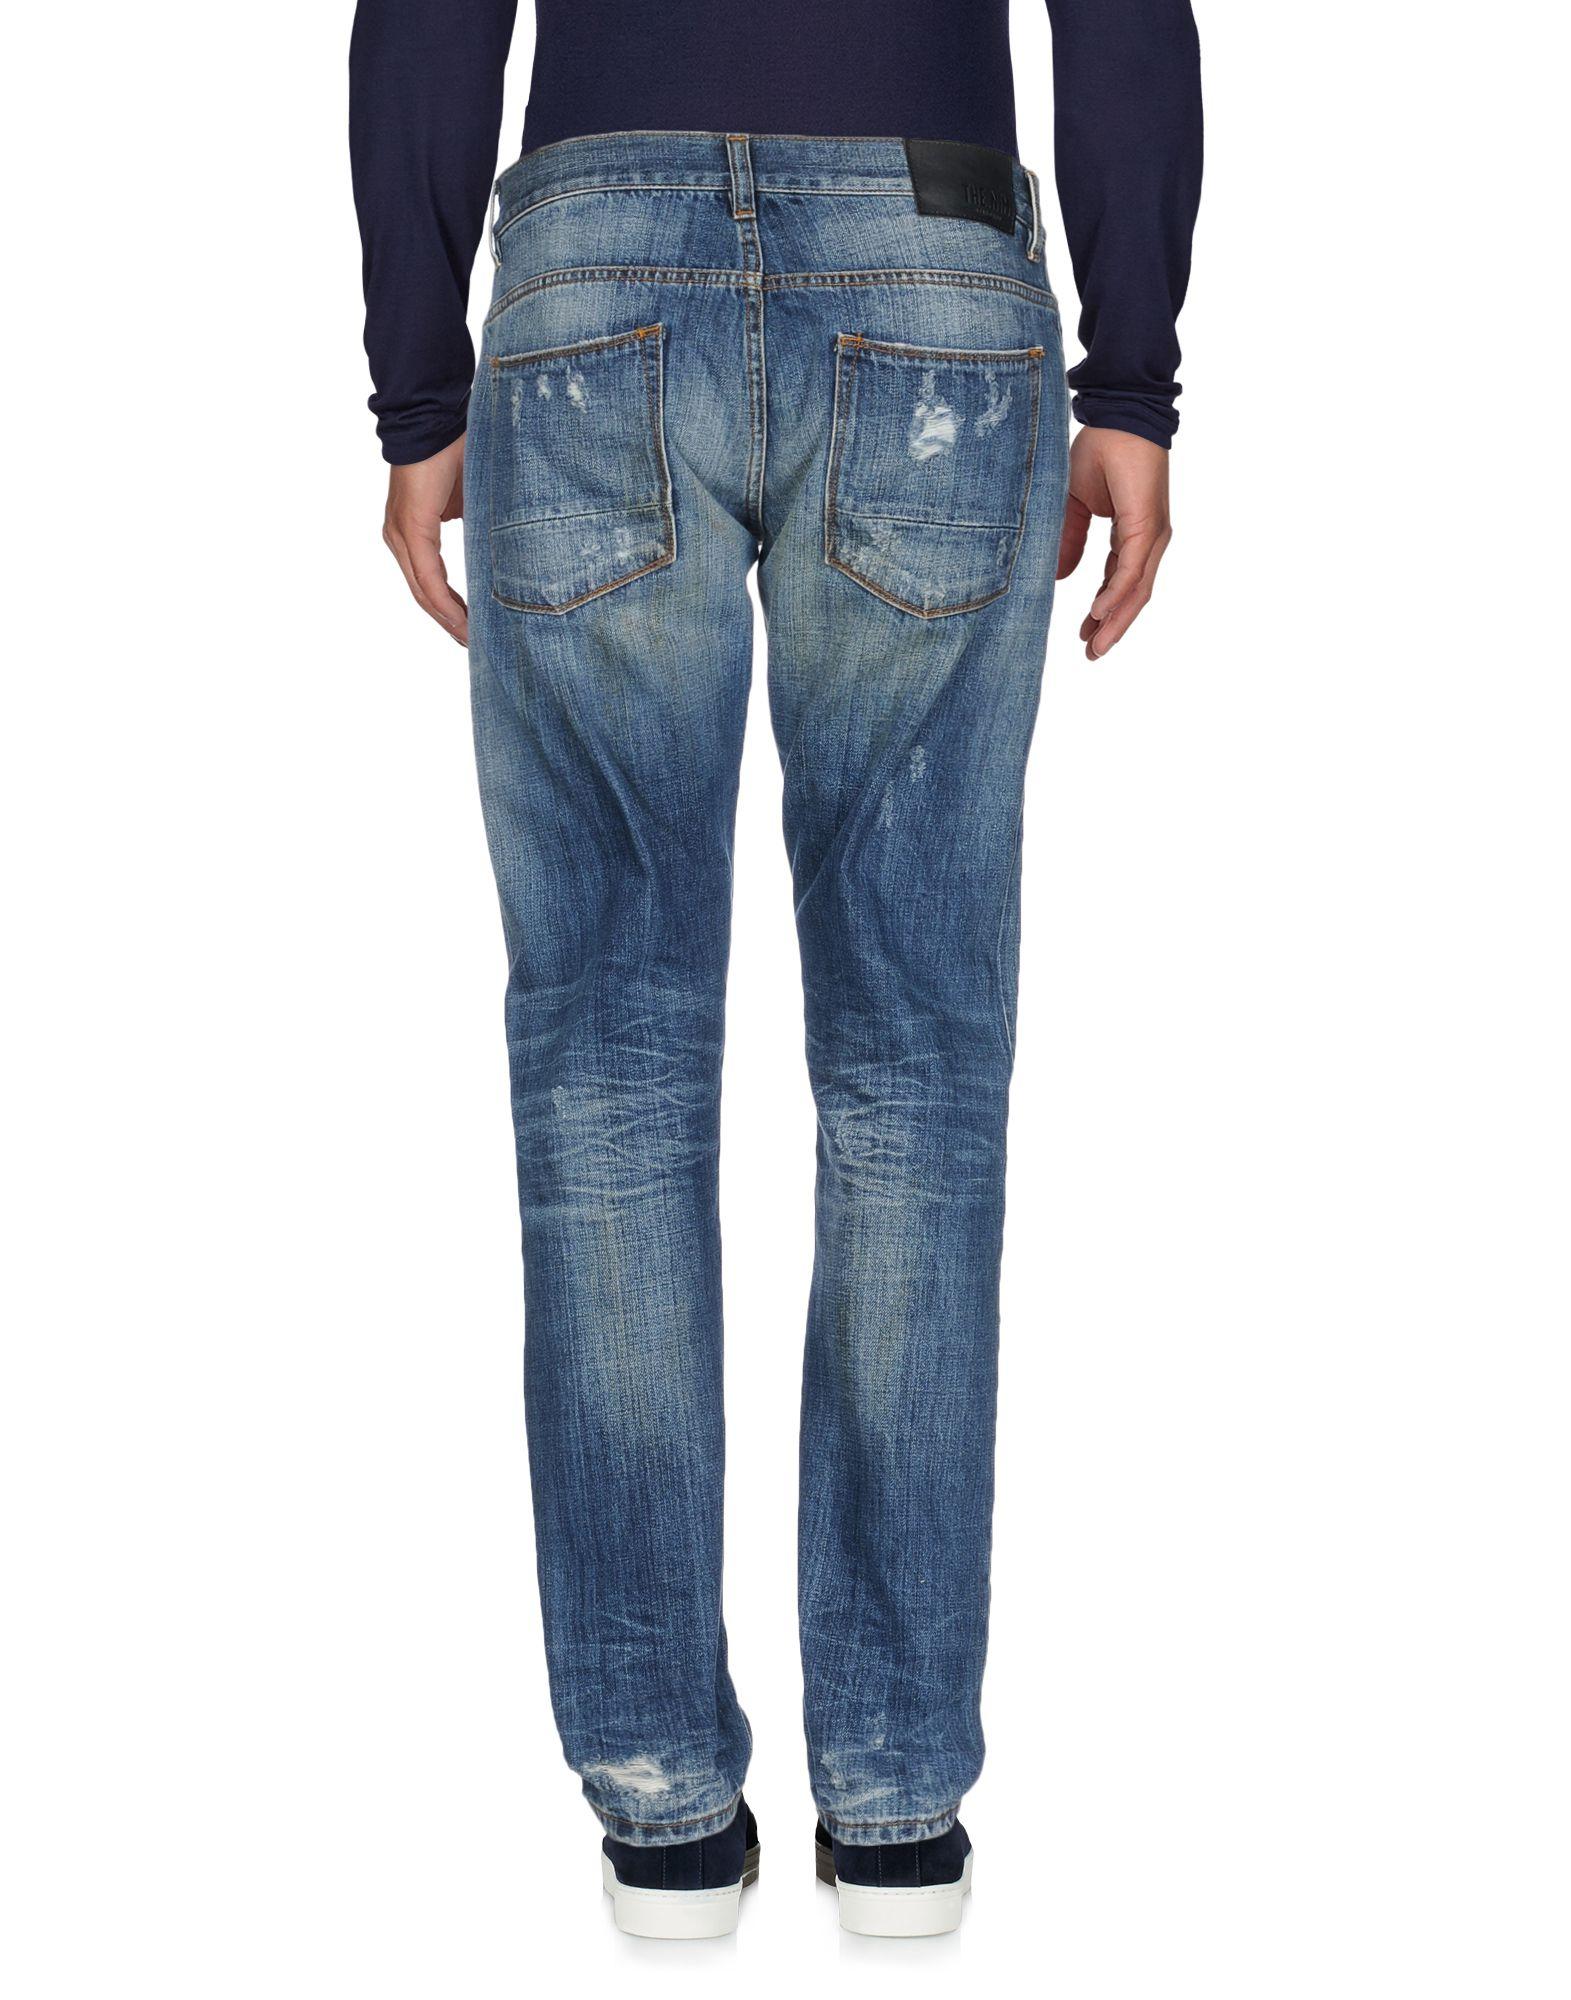 Pantaloni Jeans The.Nim The.Nim The.Nim Uomo - 42678253SB 655b95